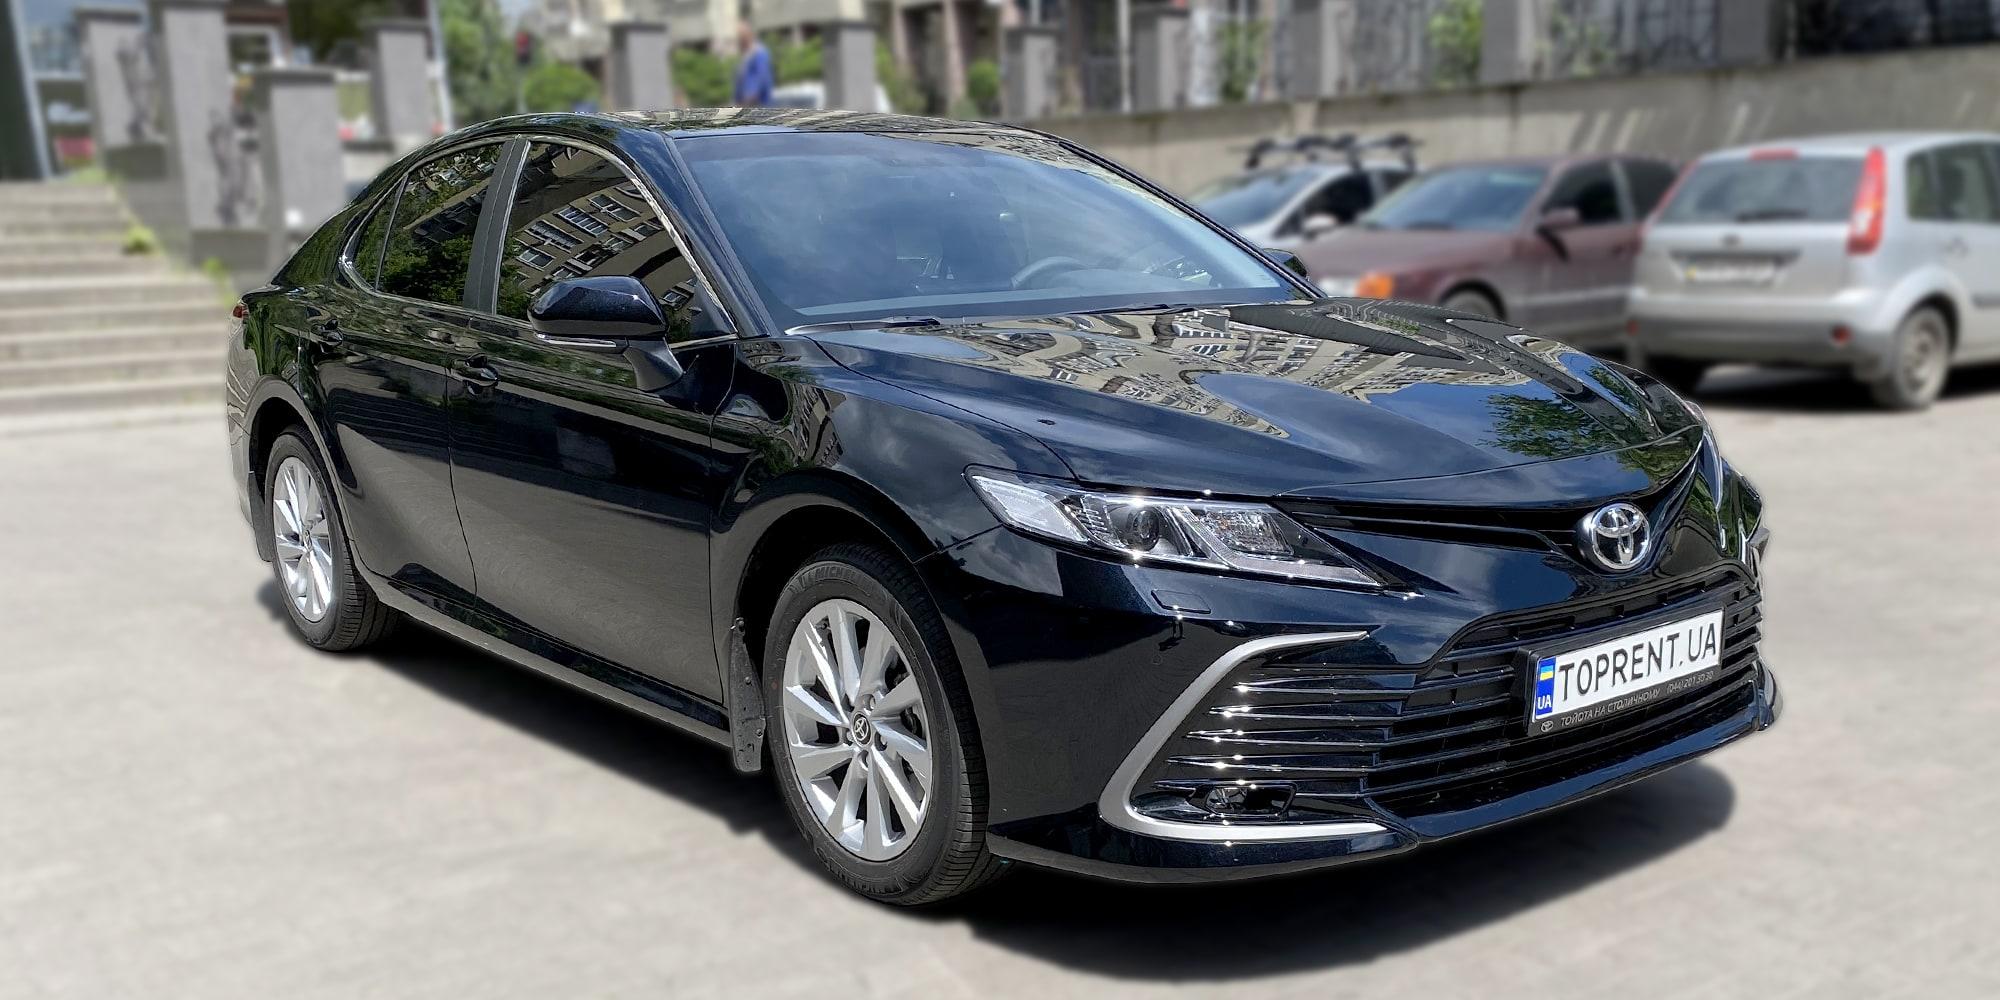 Toyota Camry xv70 2021 - TopRent.UA - 1